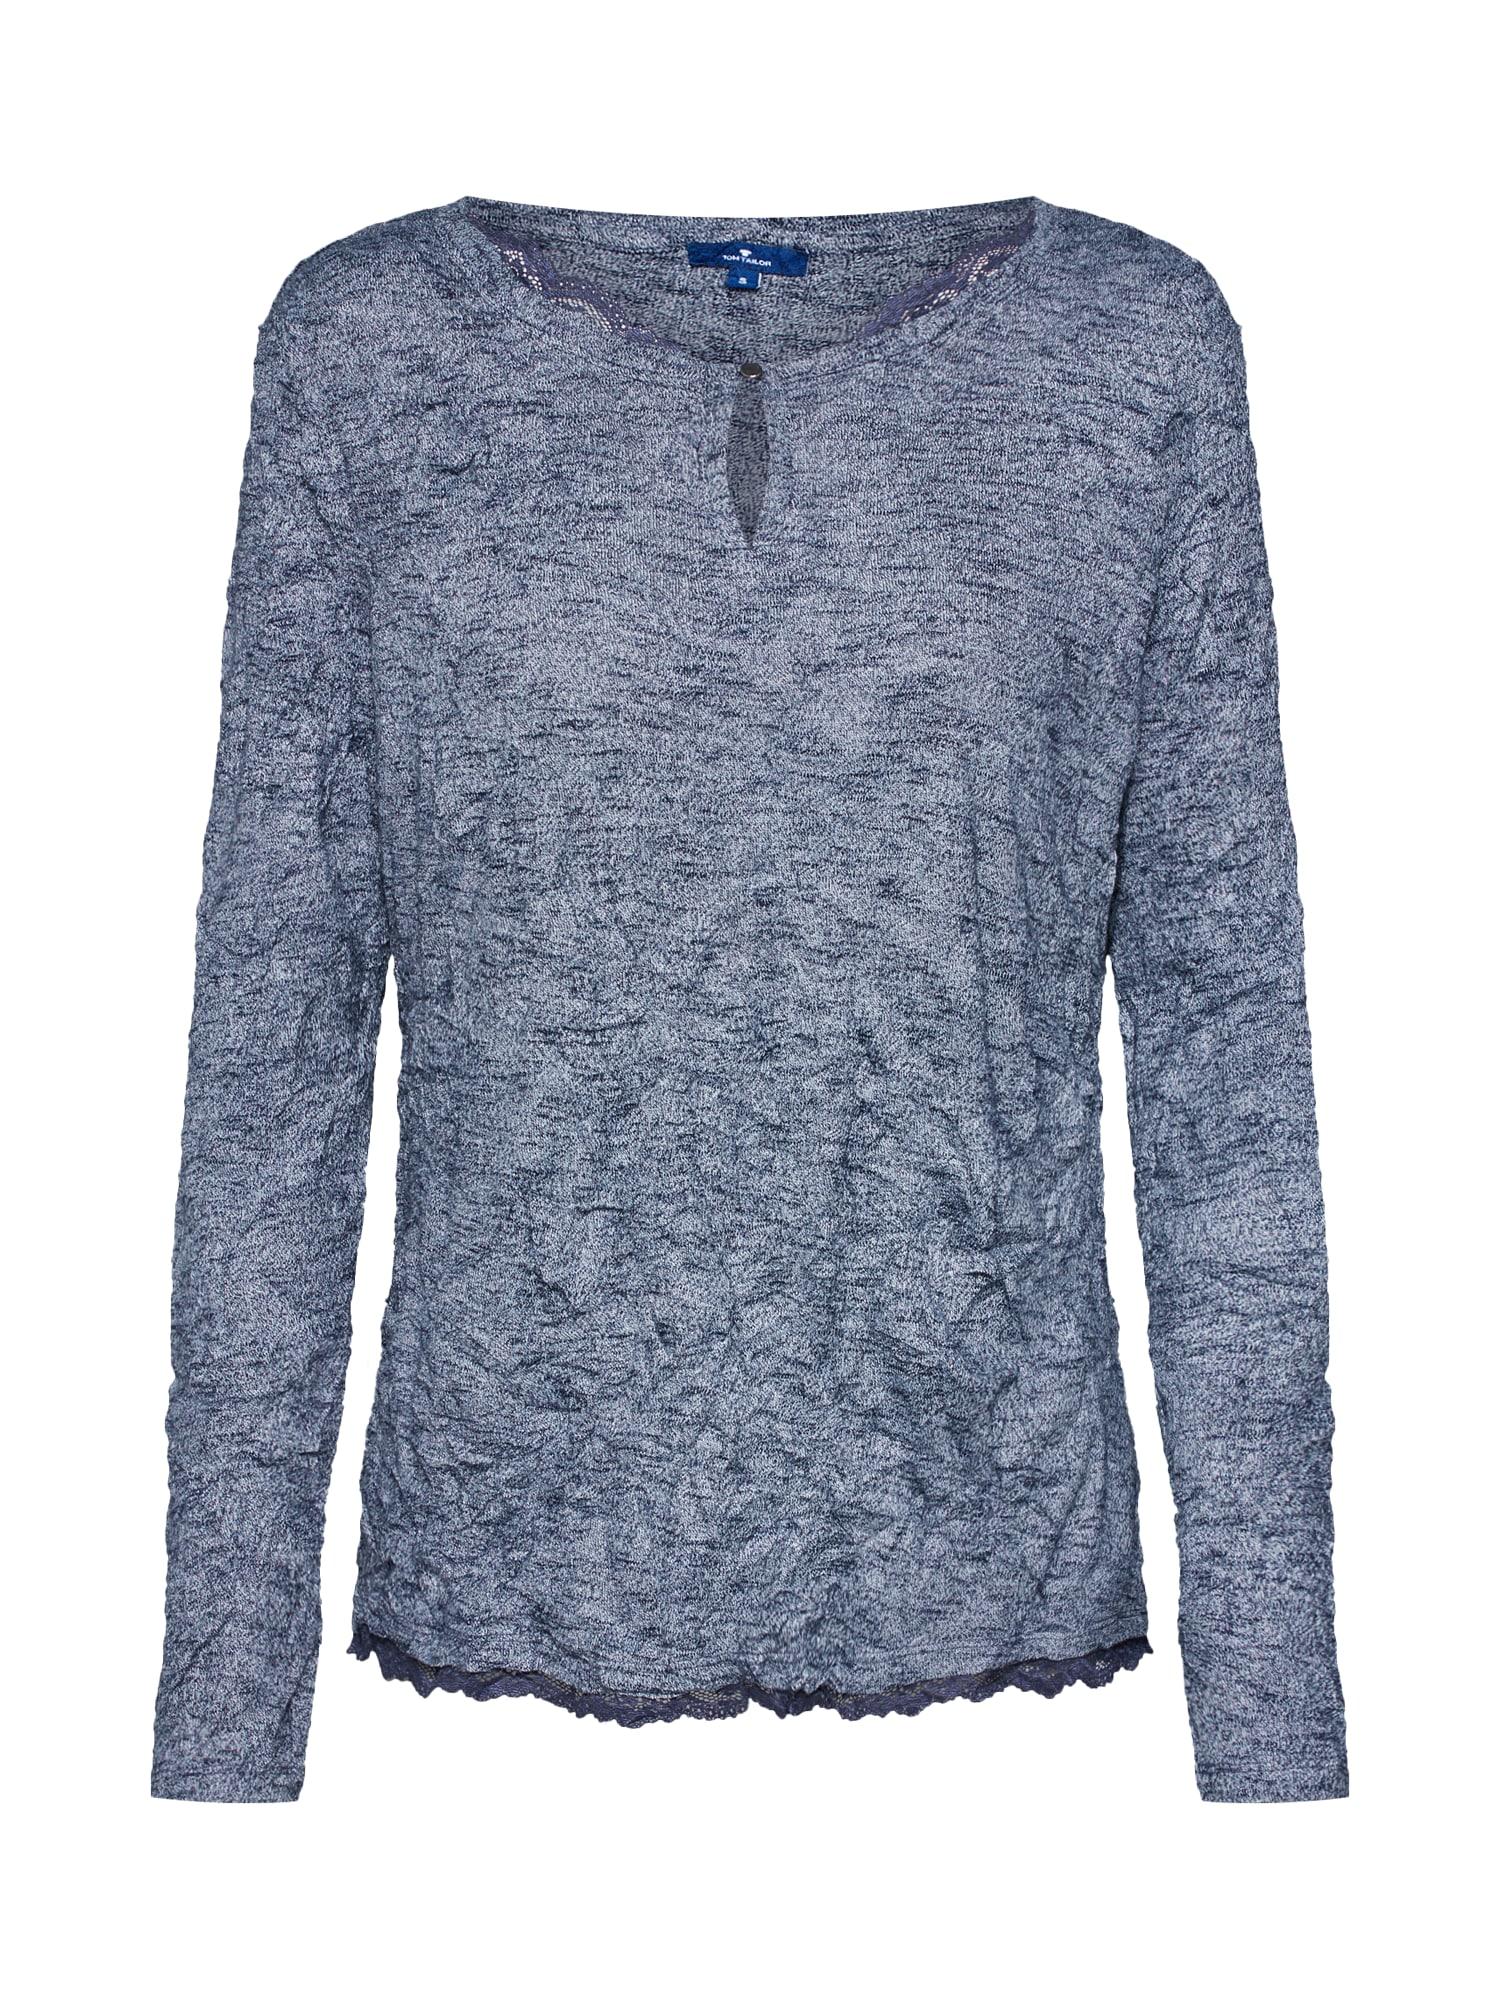 Tričko Crincle tmavě modrá TOM TAILOR